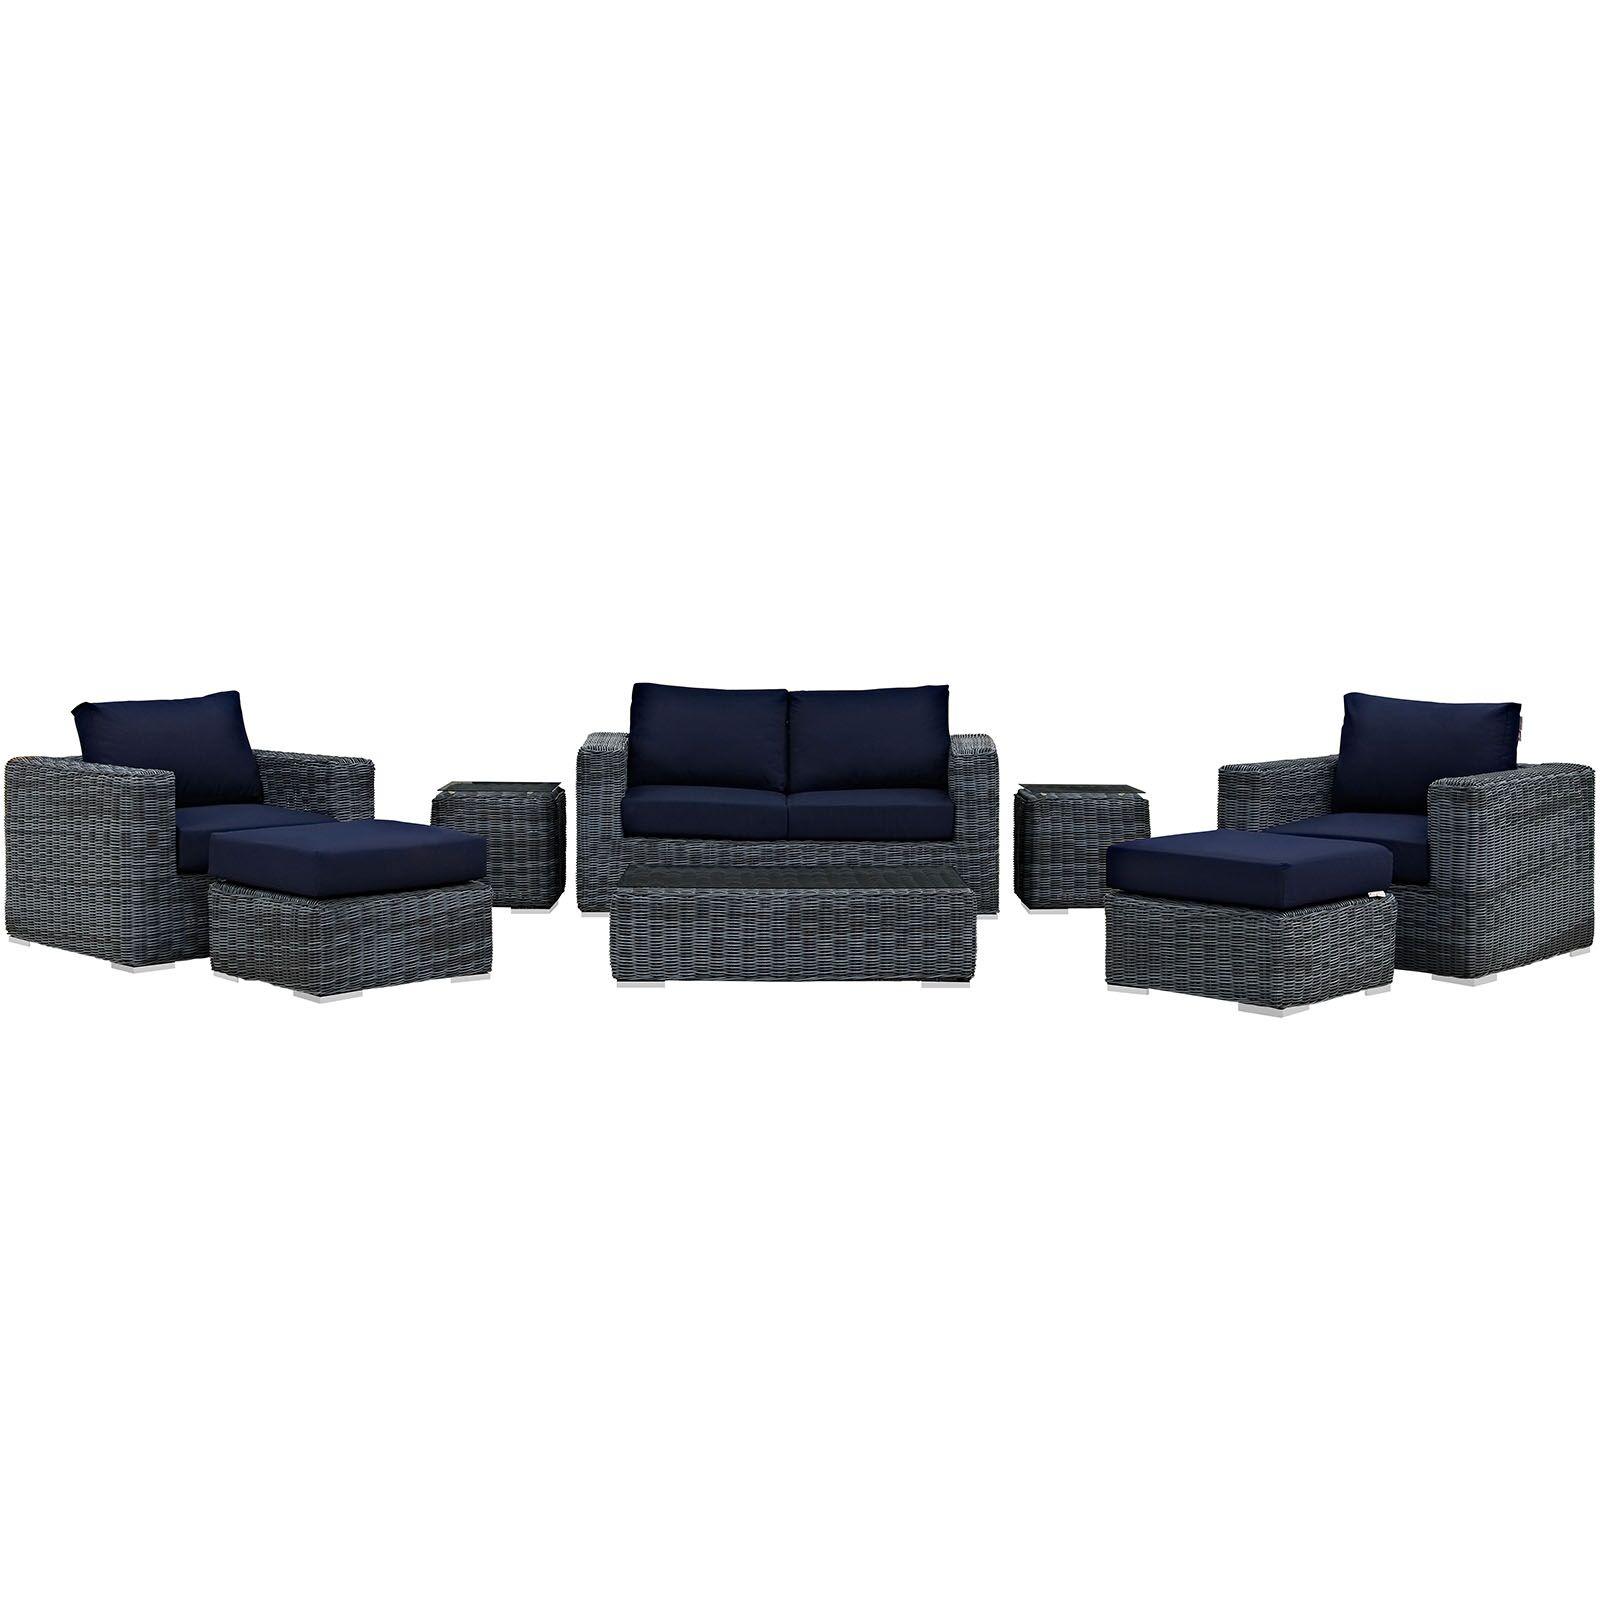 Keiran 8 Piece Sunbrella Sectional Set with Cushions Fabric: Navy